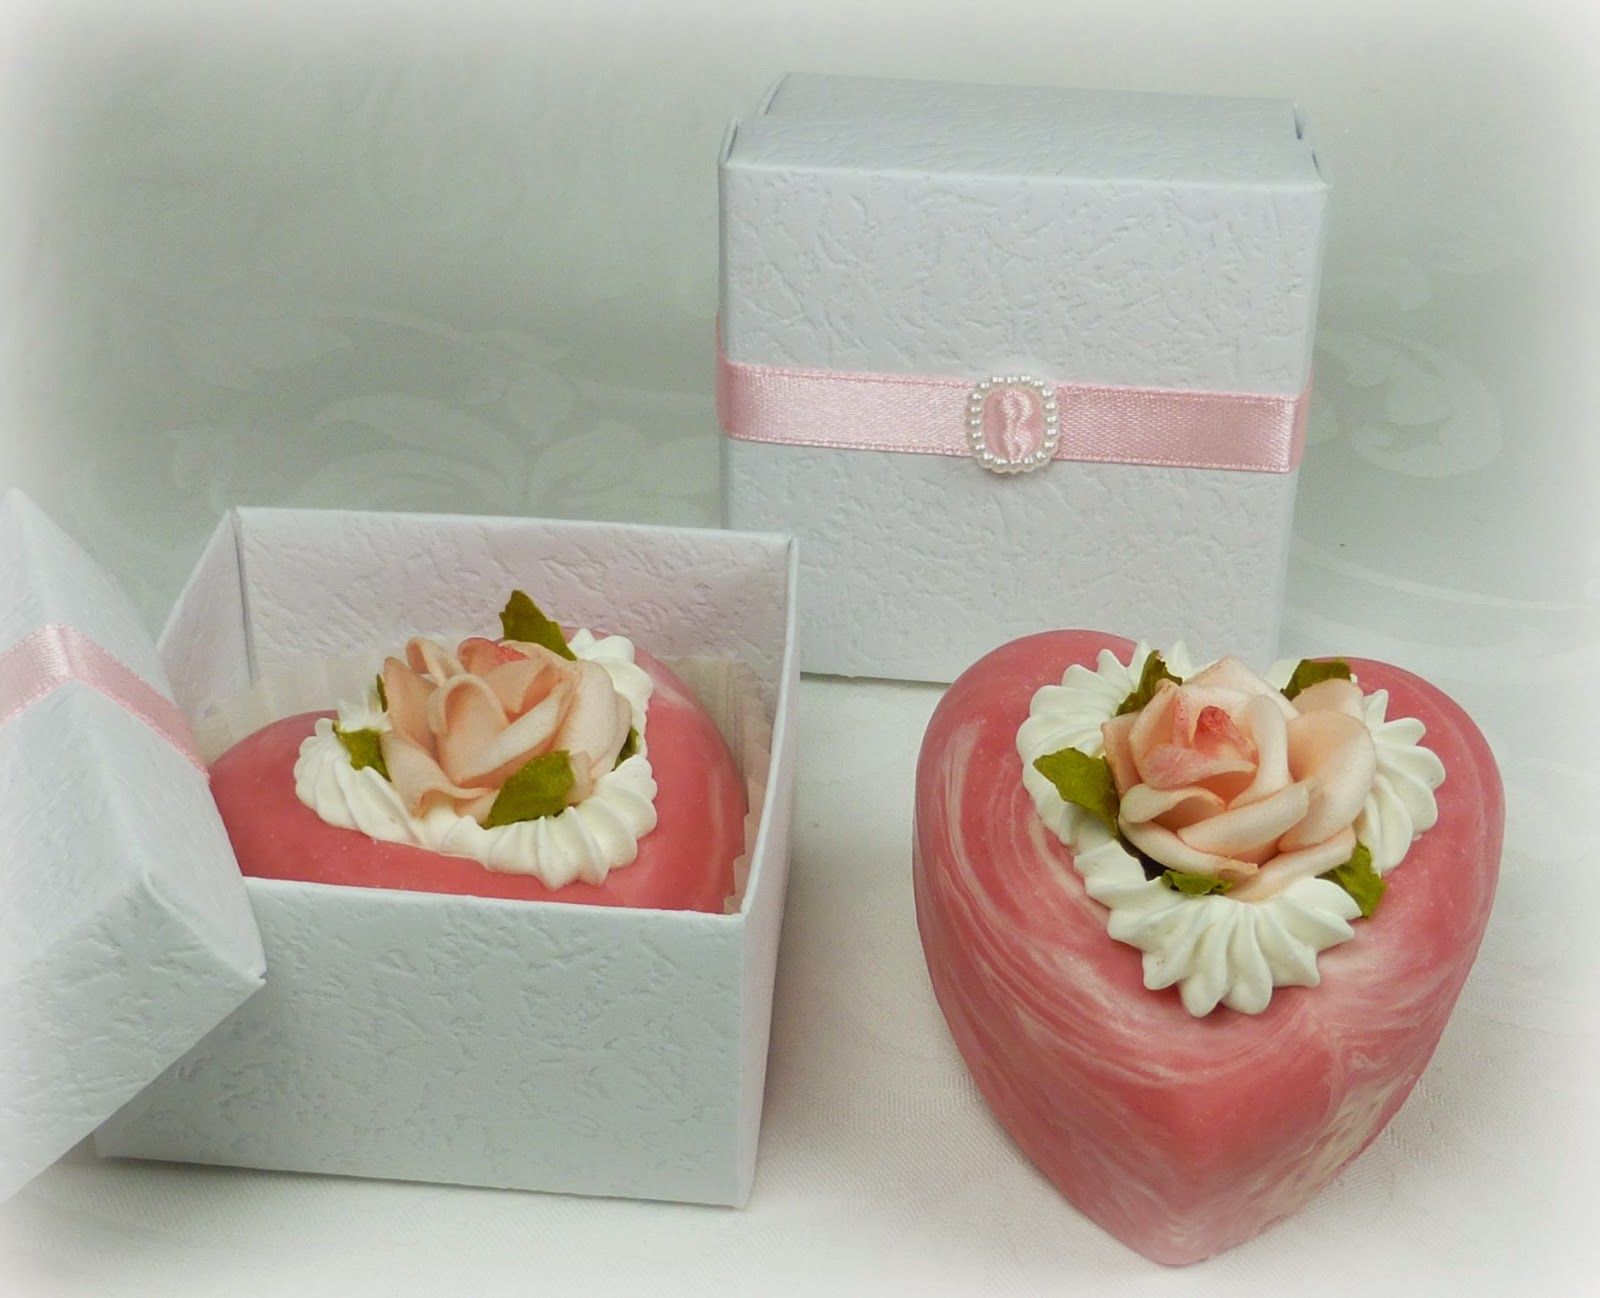 http://www.delicious-soaps.de/seifen/feine-seifen/lovely-heart---seifenherz.php